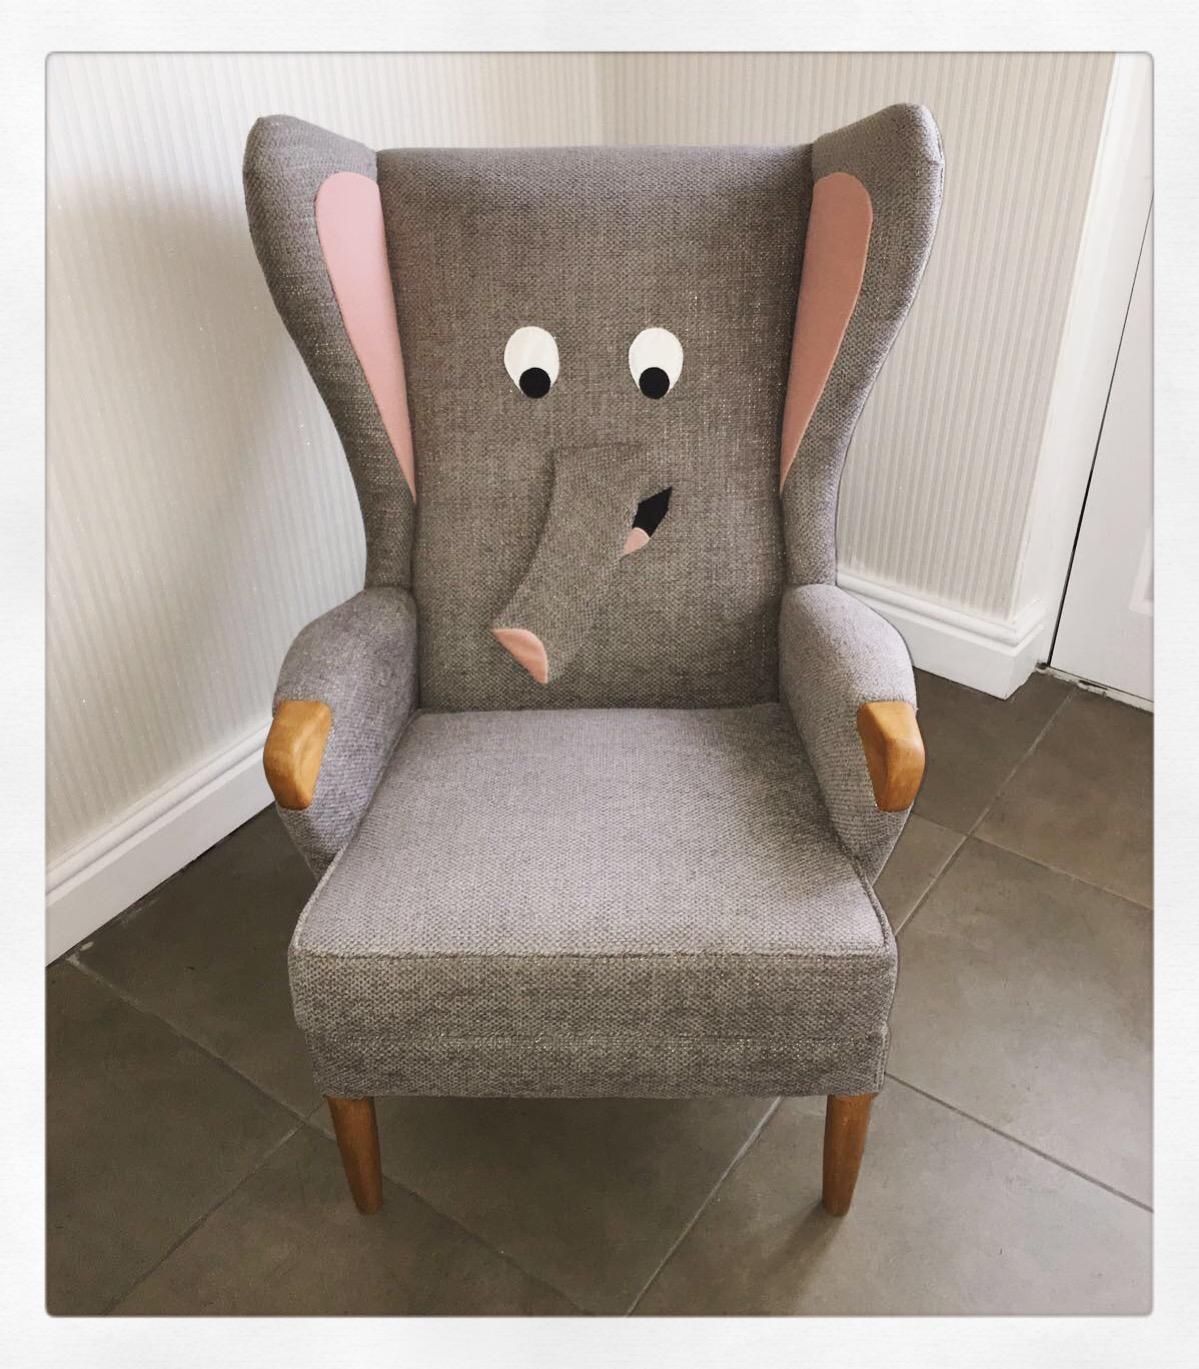 bespoke chair upholstery lonson